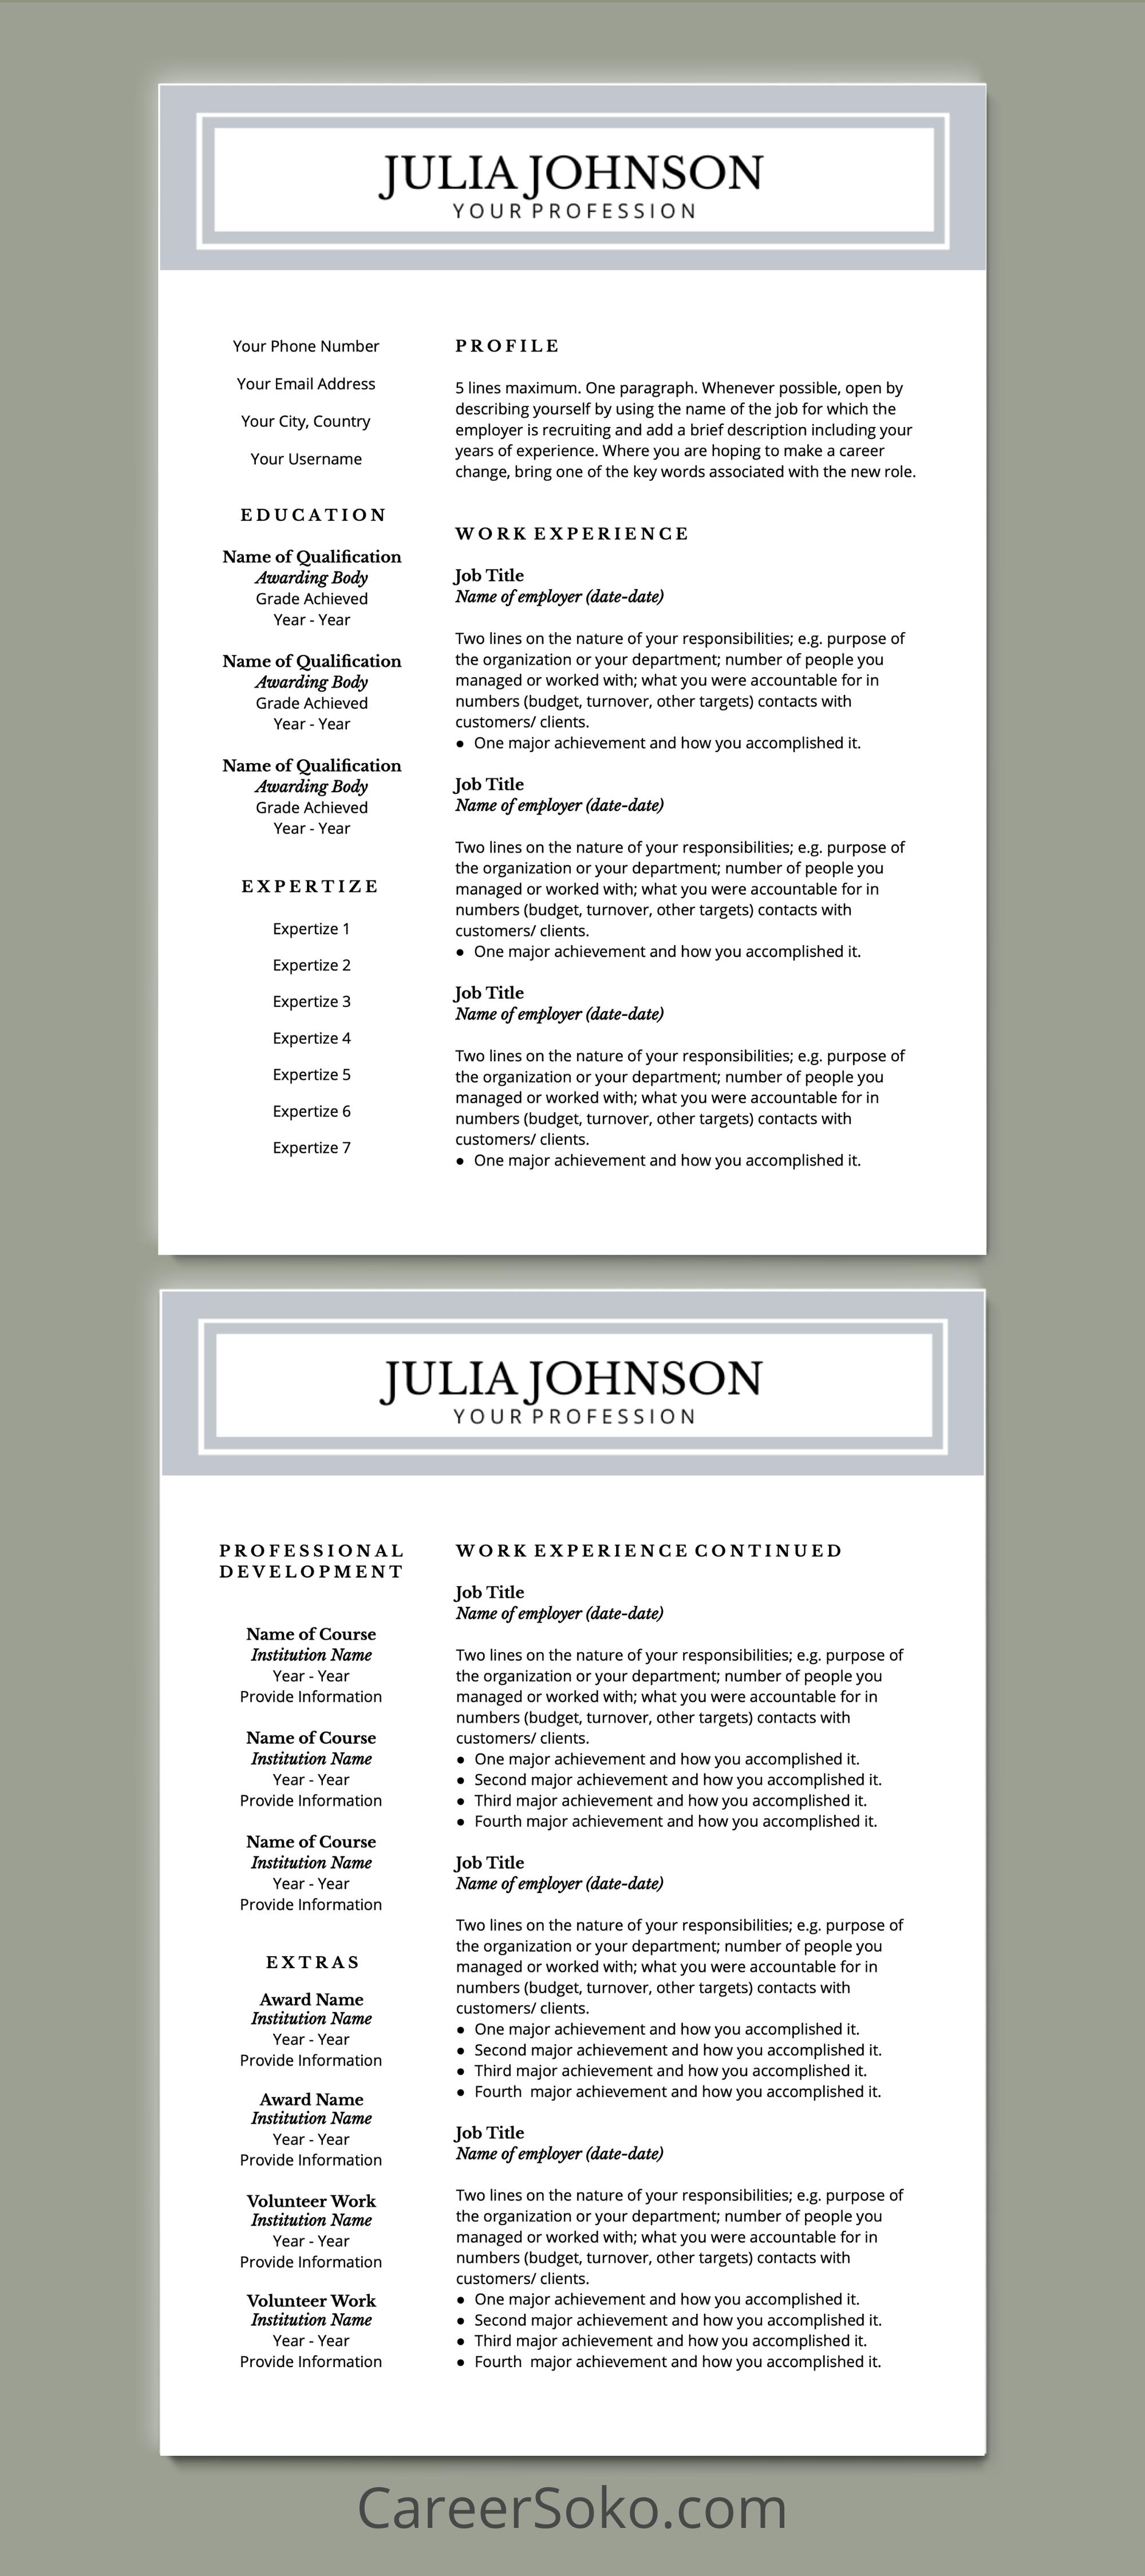 Google Docs Resume Teacher Resume Resume Template Cv Template Resume And Cover Letter Template Resume Design Template Resume Template Cover Letter Template